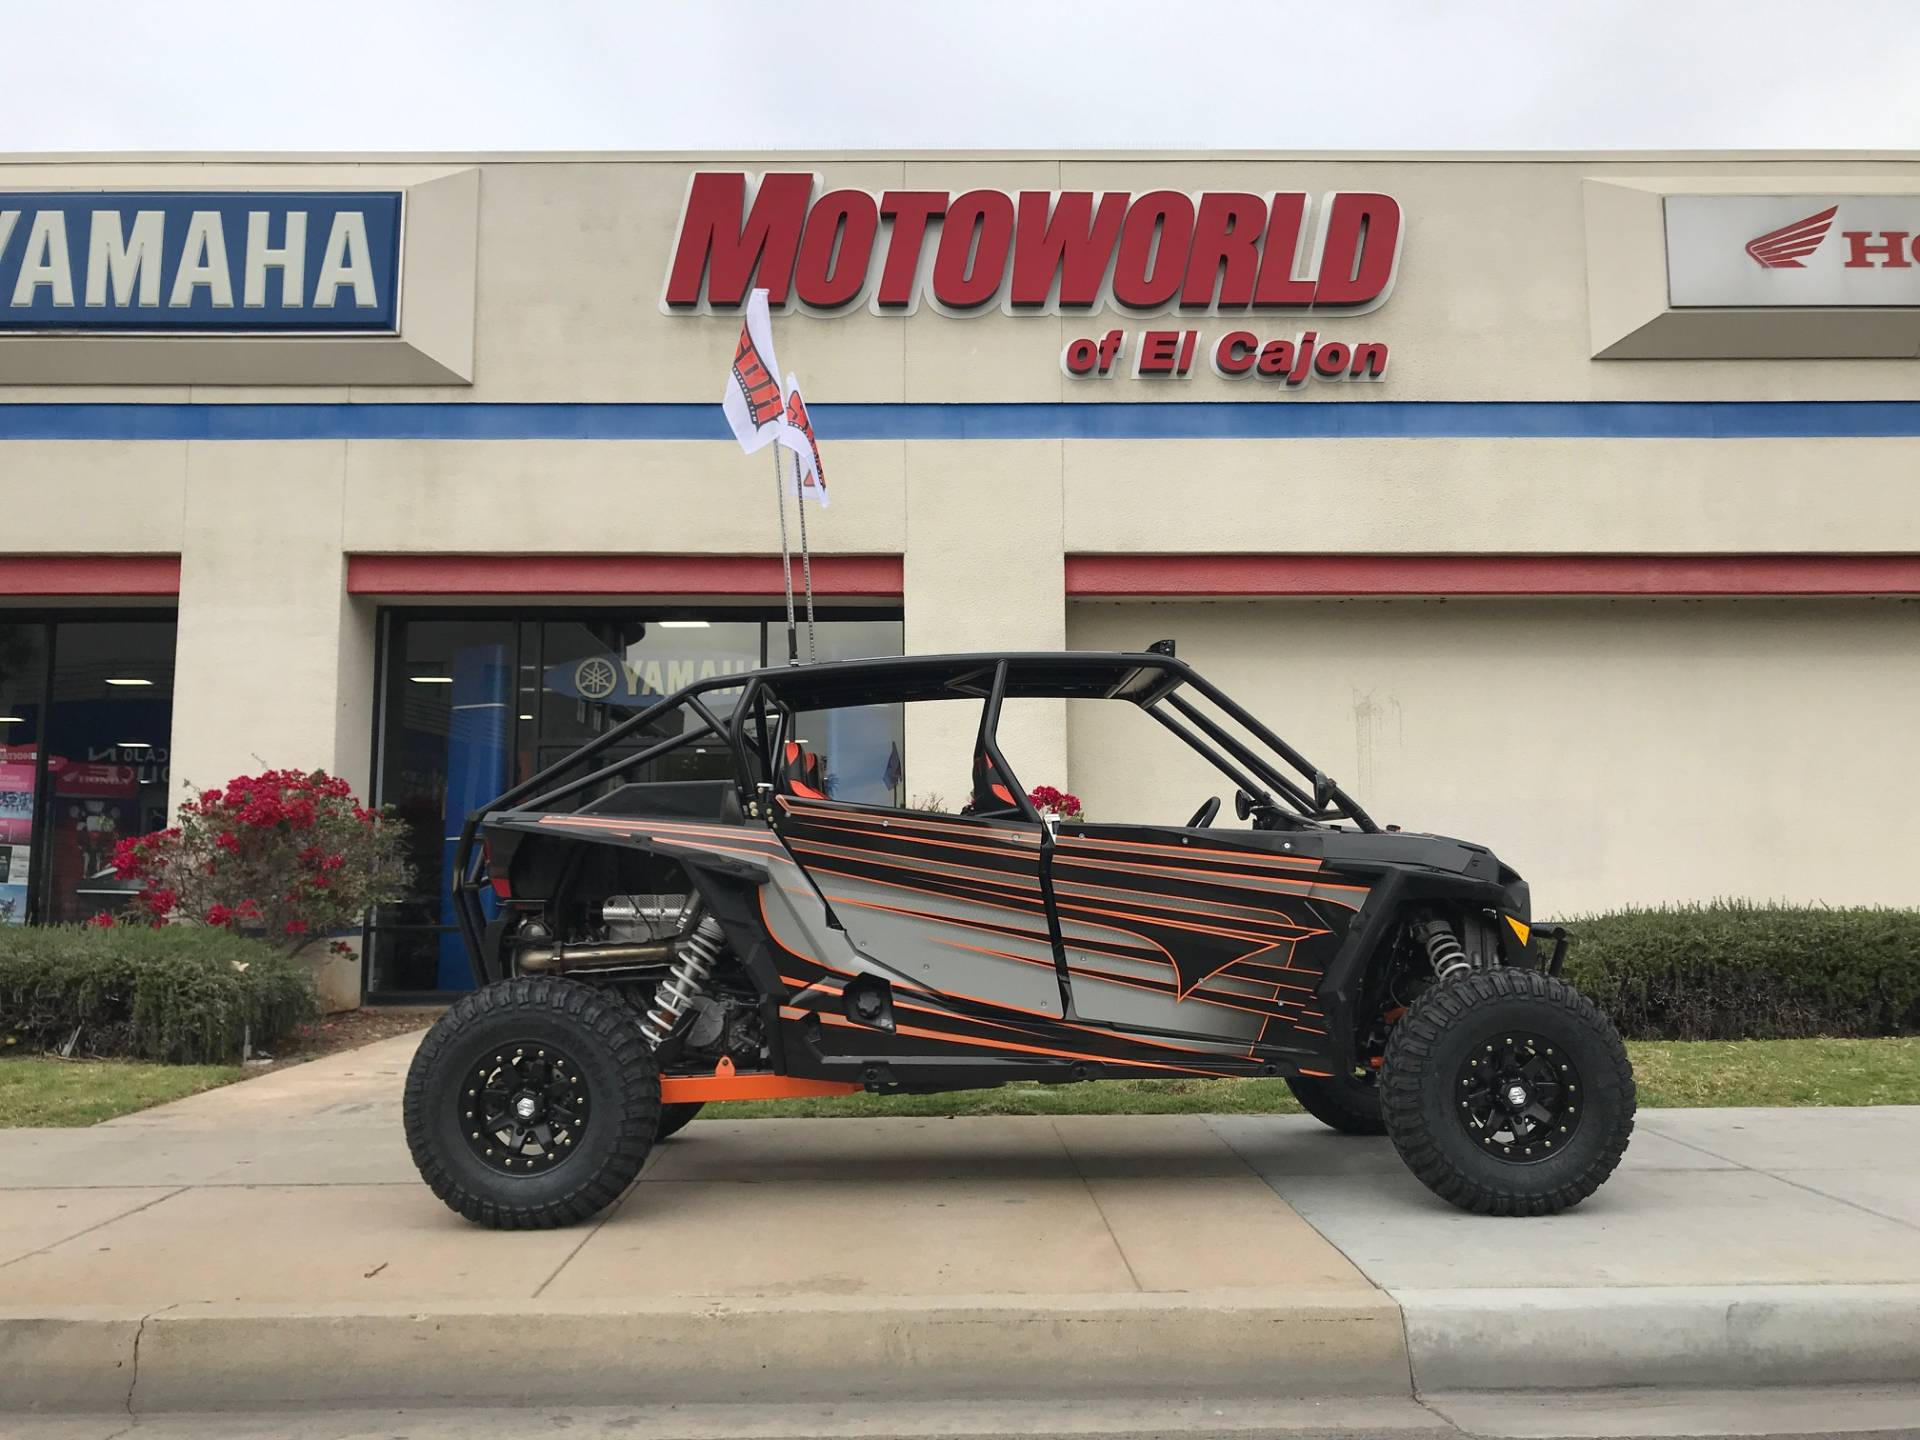 Polaris Atv For Sale San Diego Ca >> 2018 Polaris RZR XP 4 Turbo EPS | Grey 2018 Polaris RZR XP 4 ATV in El Cajon CA | 4805695532 ...